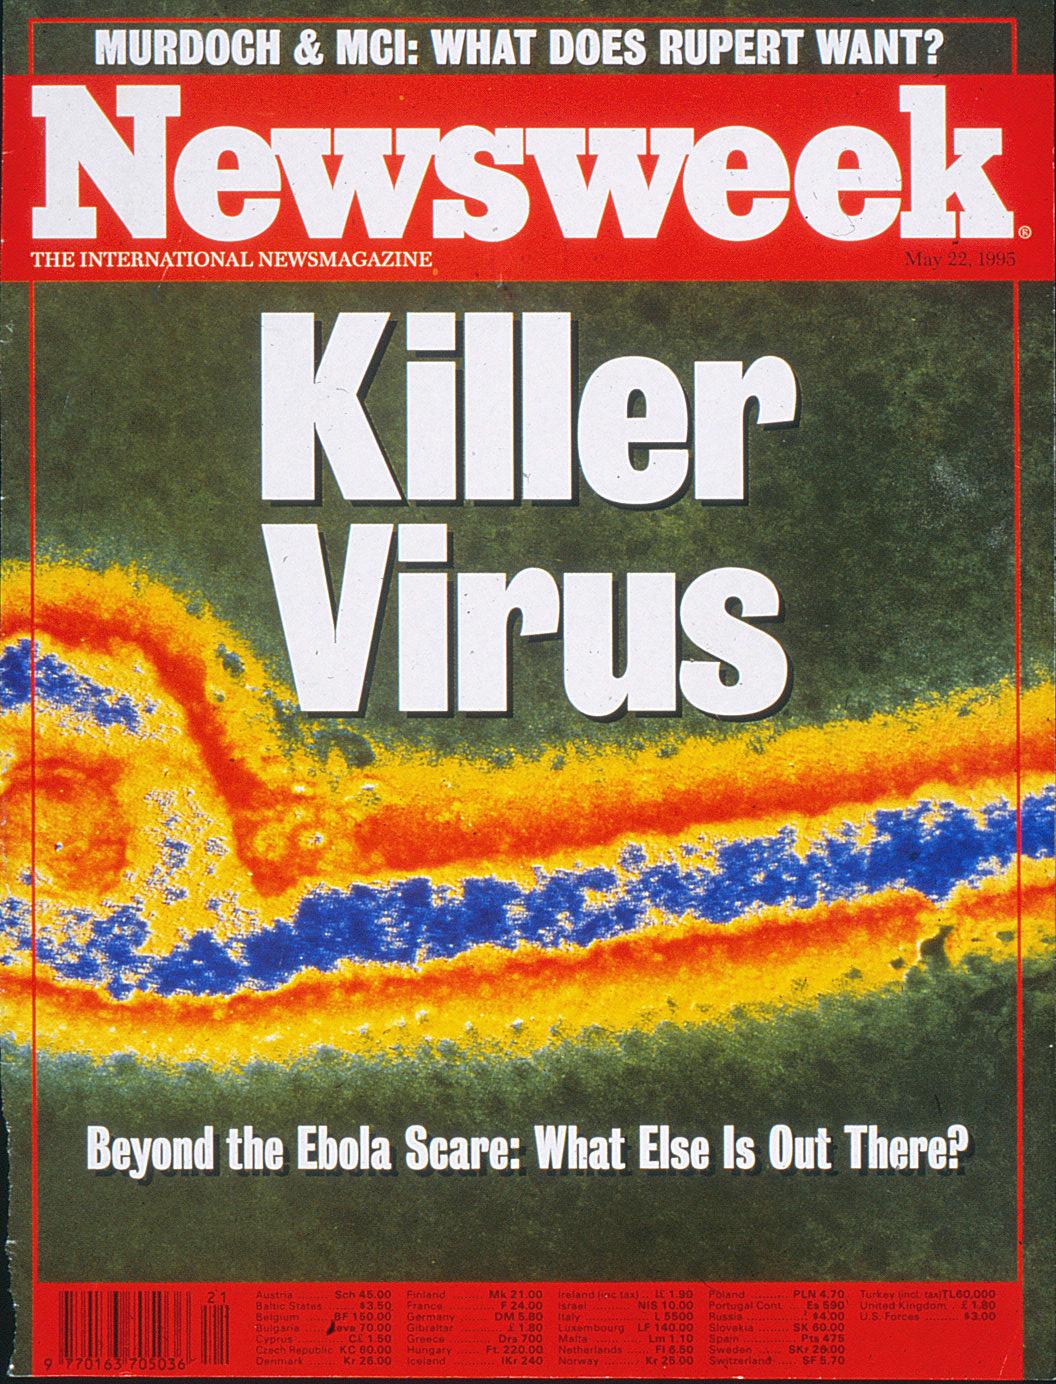 Time-Ebola-cover-1995-(deleted-4db1db6a-86b1a6-70825cf0).jpg